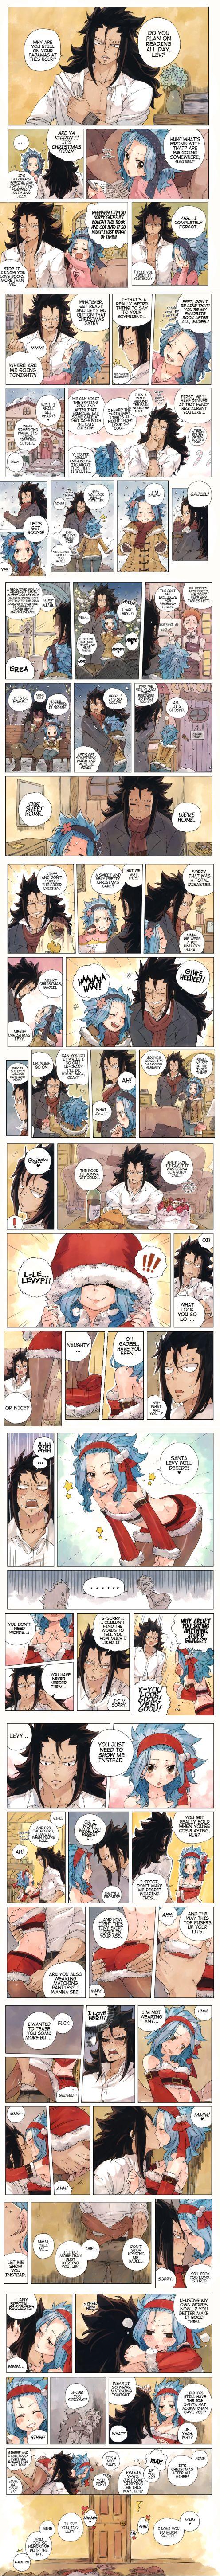 ♥ Dear Santa ♥ #GaLe